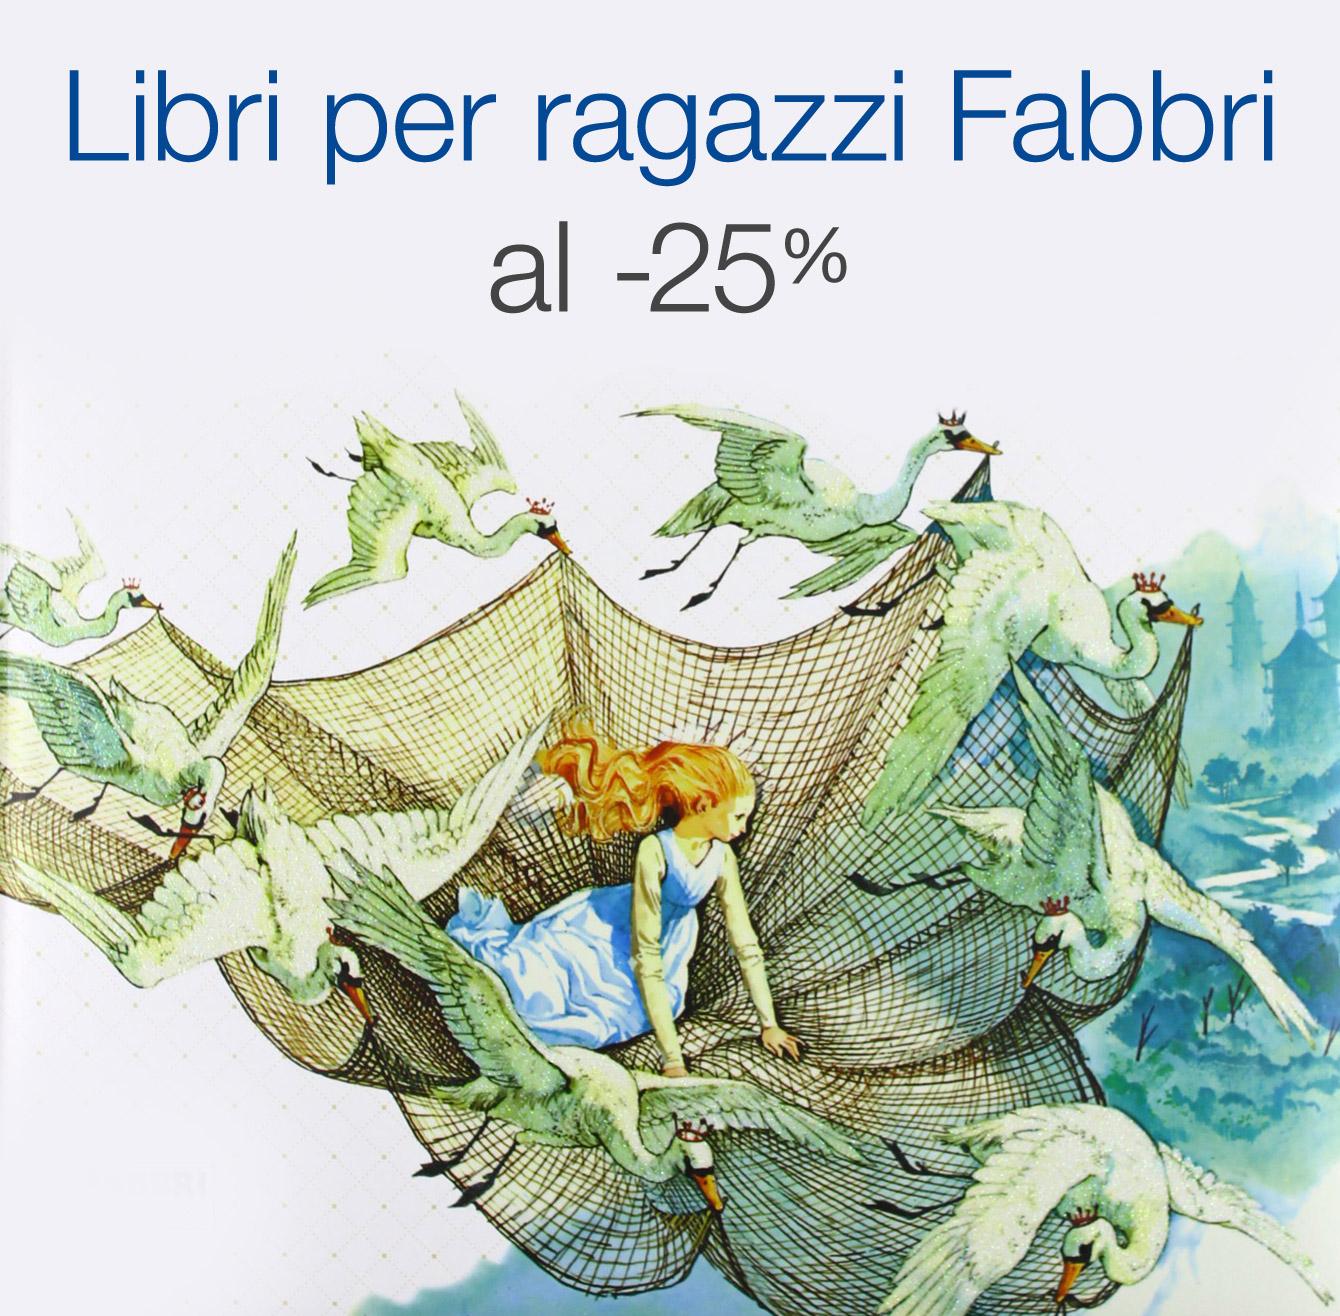 Libri per ragazzi Fabbri al -25%